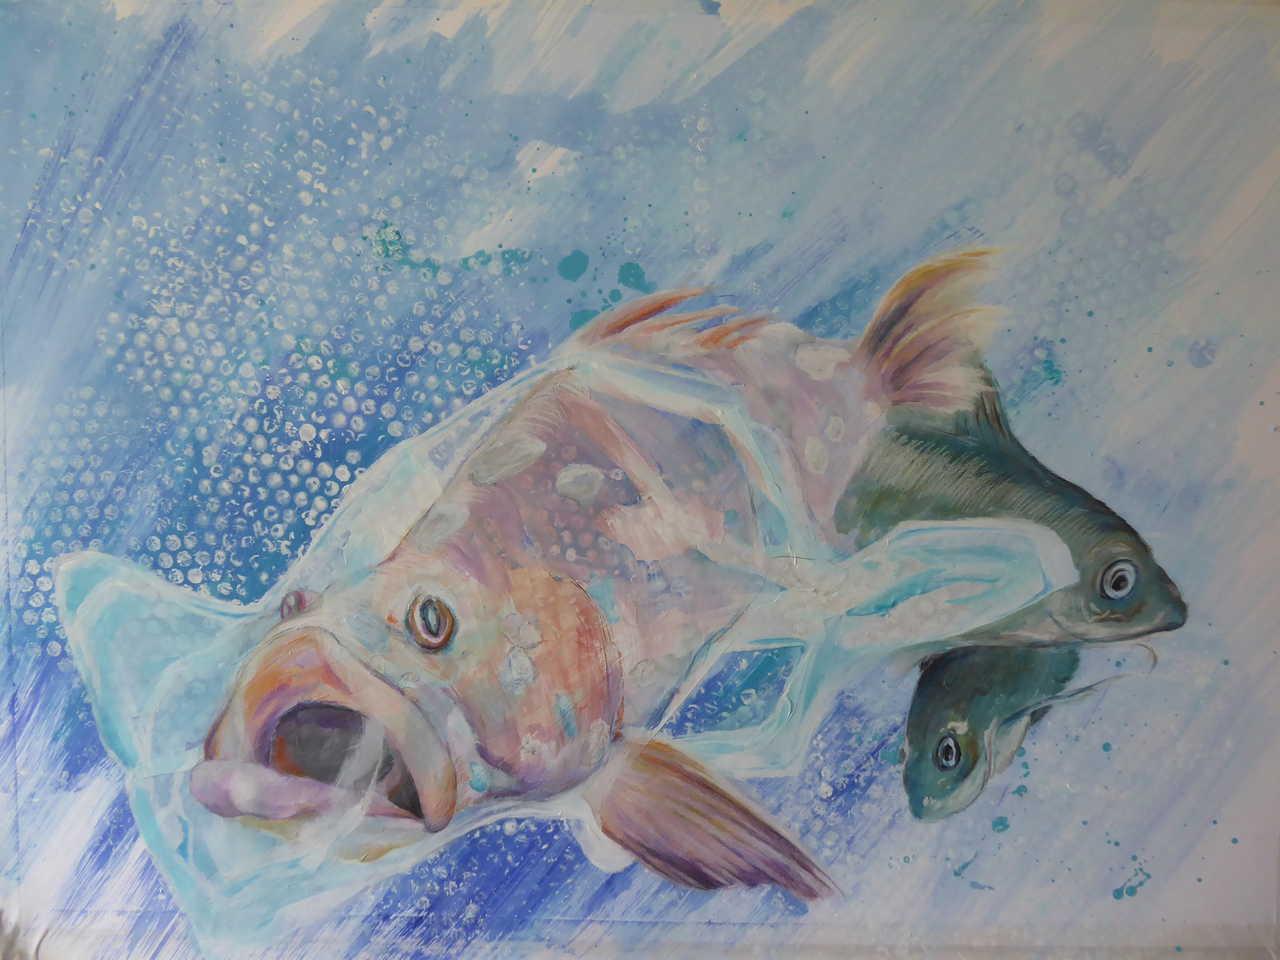 Blindfisch, Mischtechnik, 60 x 84 cm, 2019